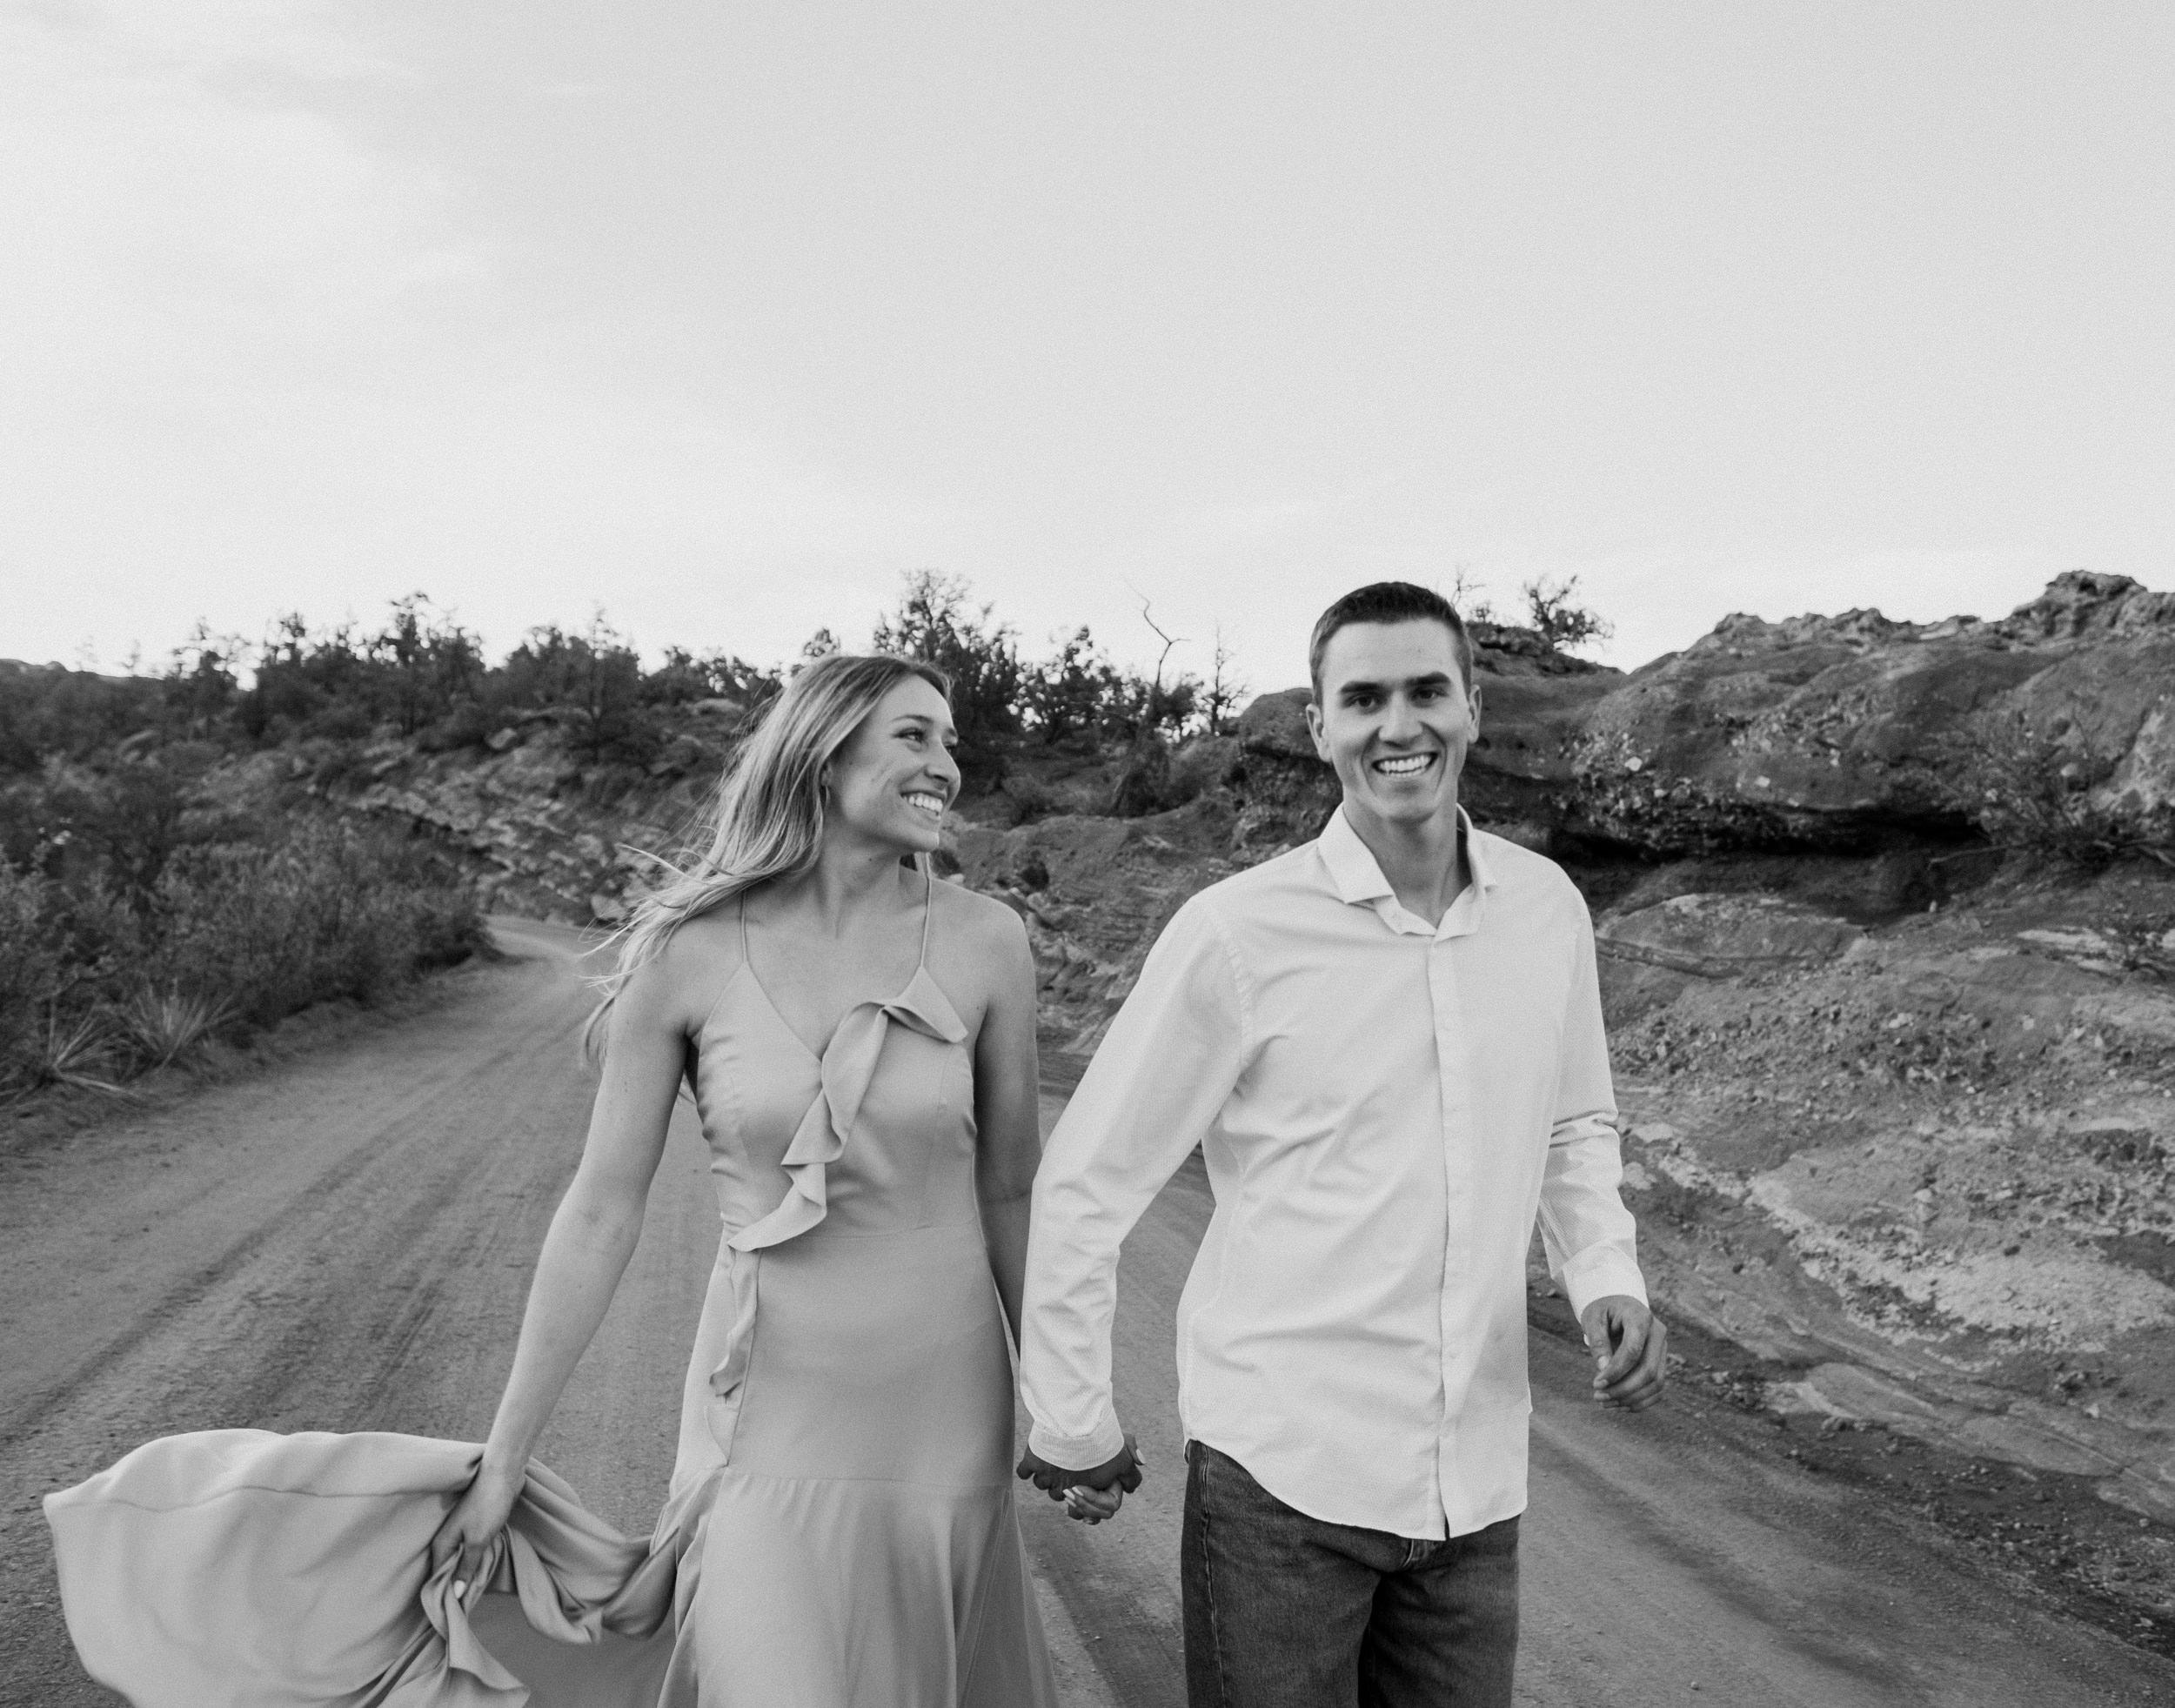 Garden of the Gods Elopement. Colorado wedding photographer. Colorado Springs elopement location.